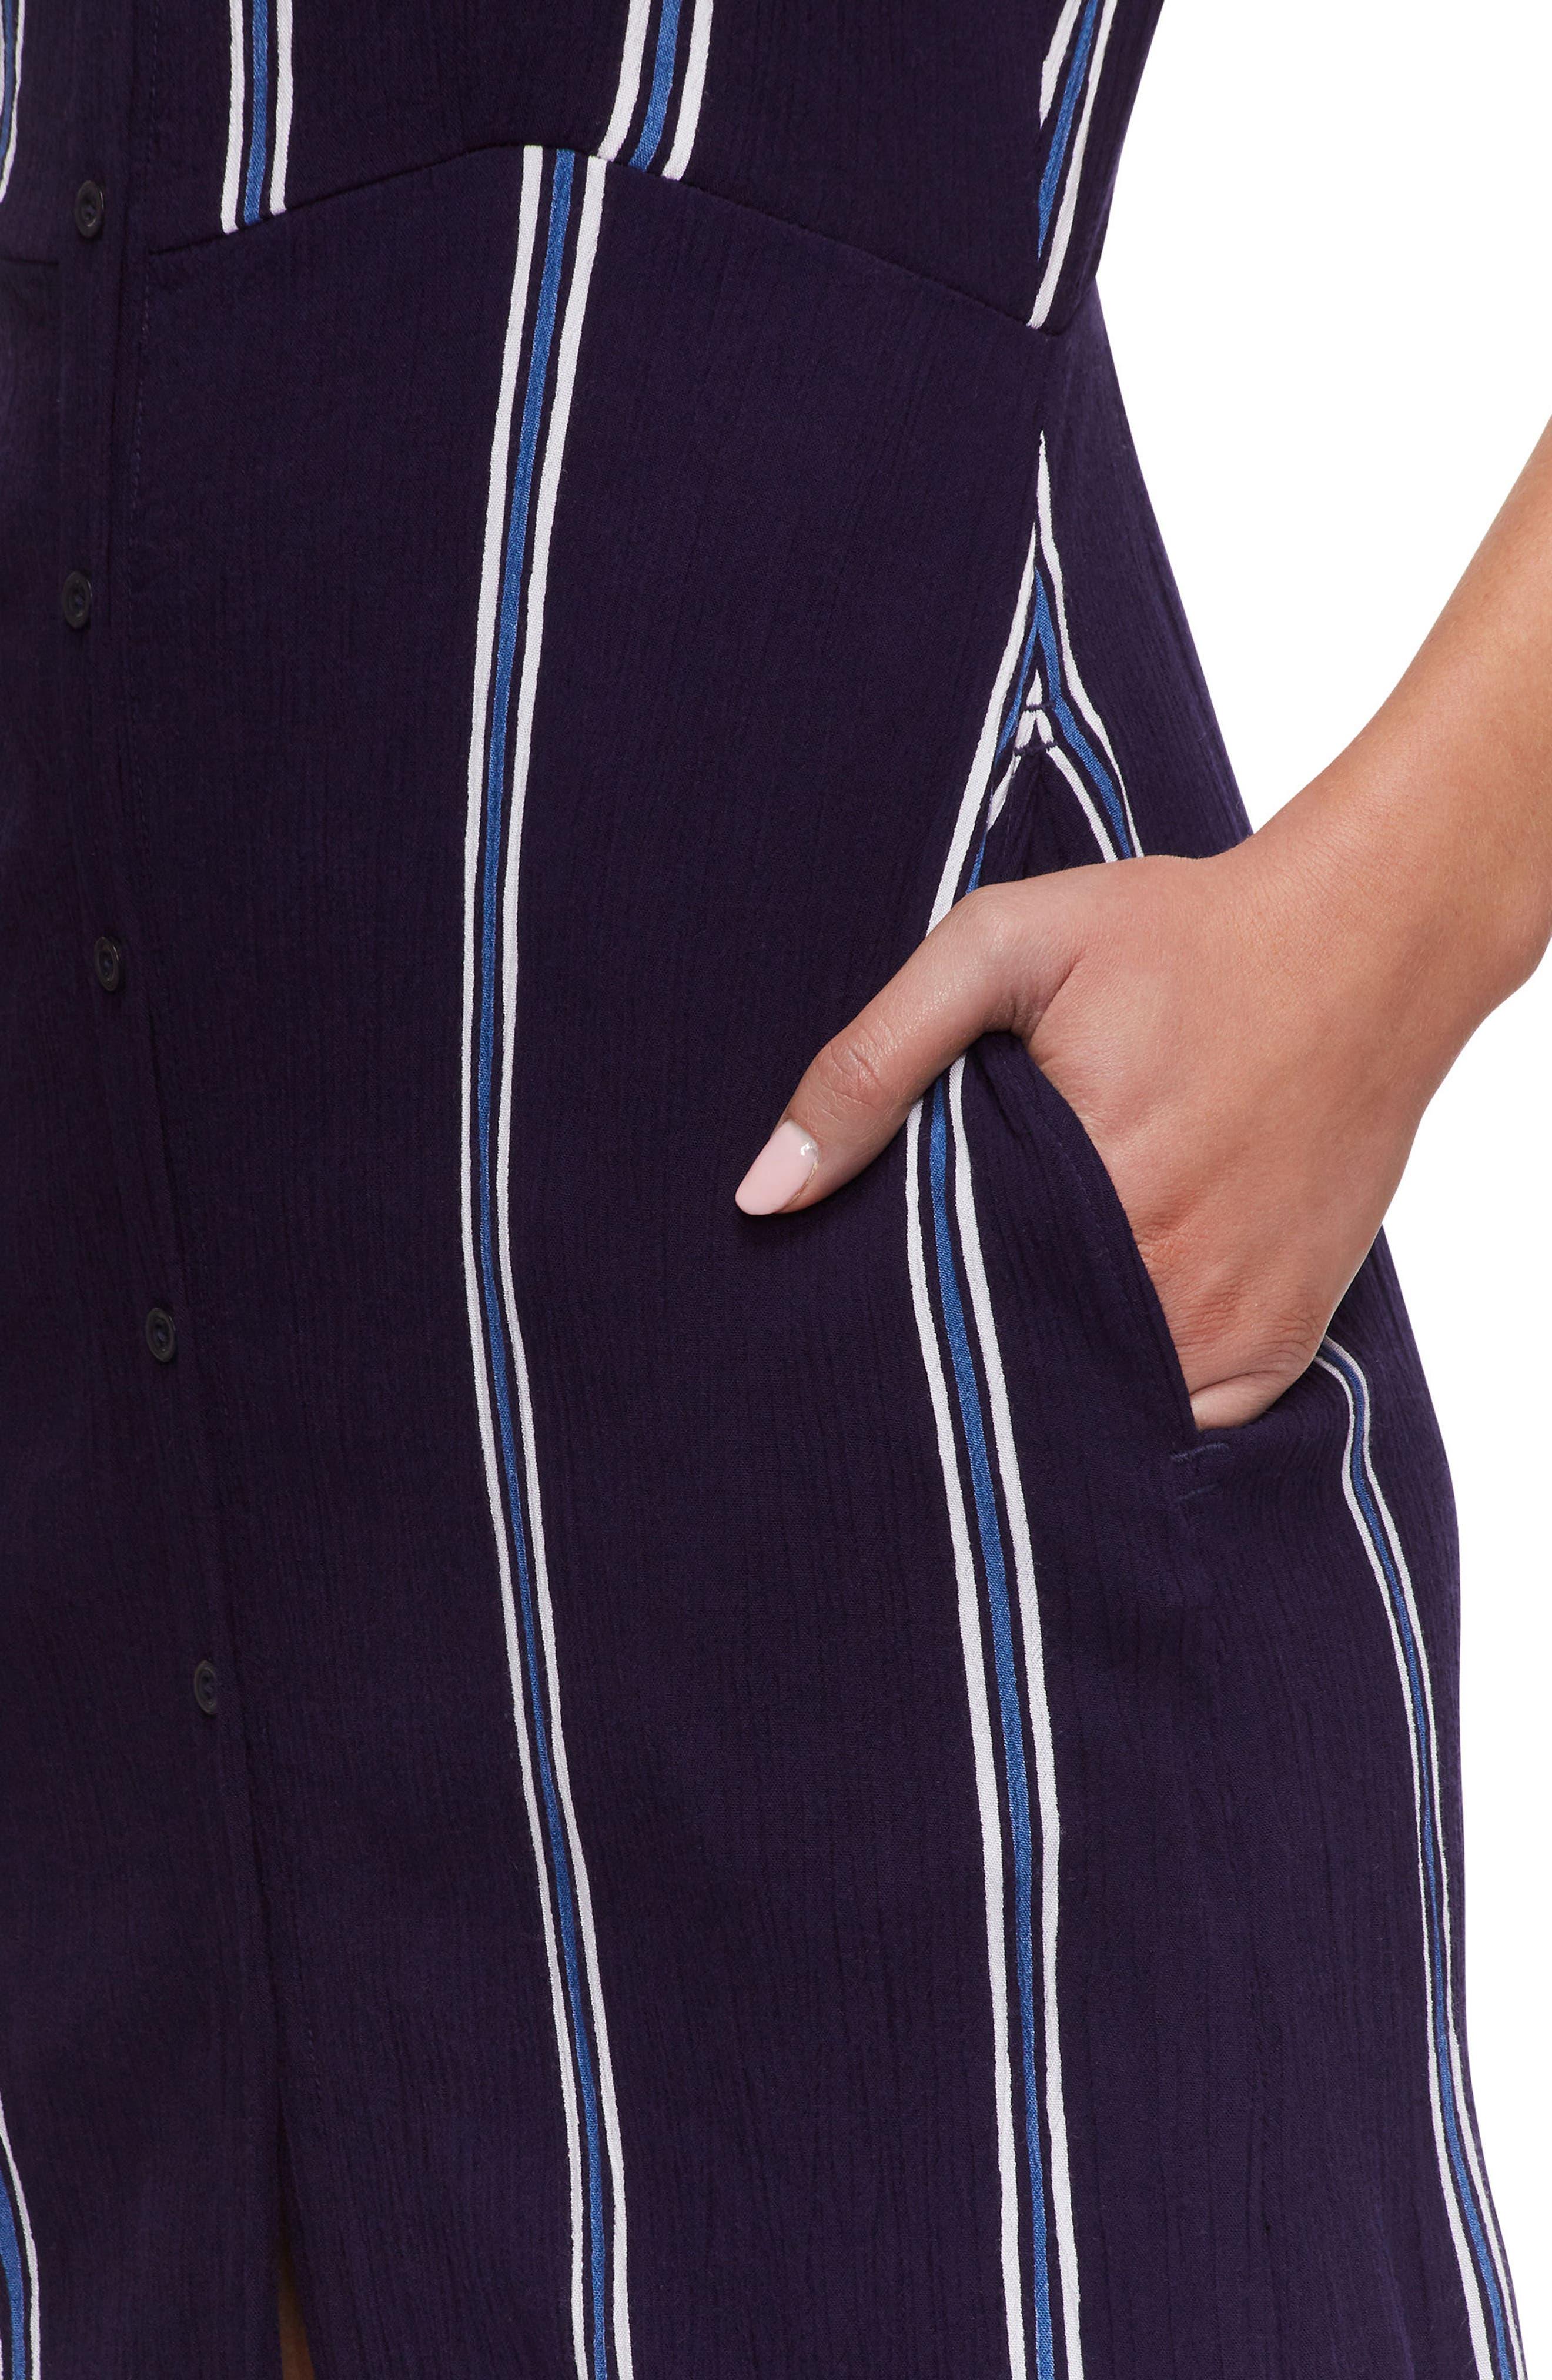 Geni Cover-Up Dress,                             Alternate thumbnail 4, color,                             Evening Blue/White Stripe